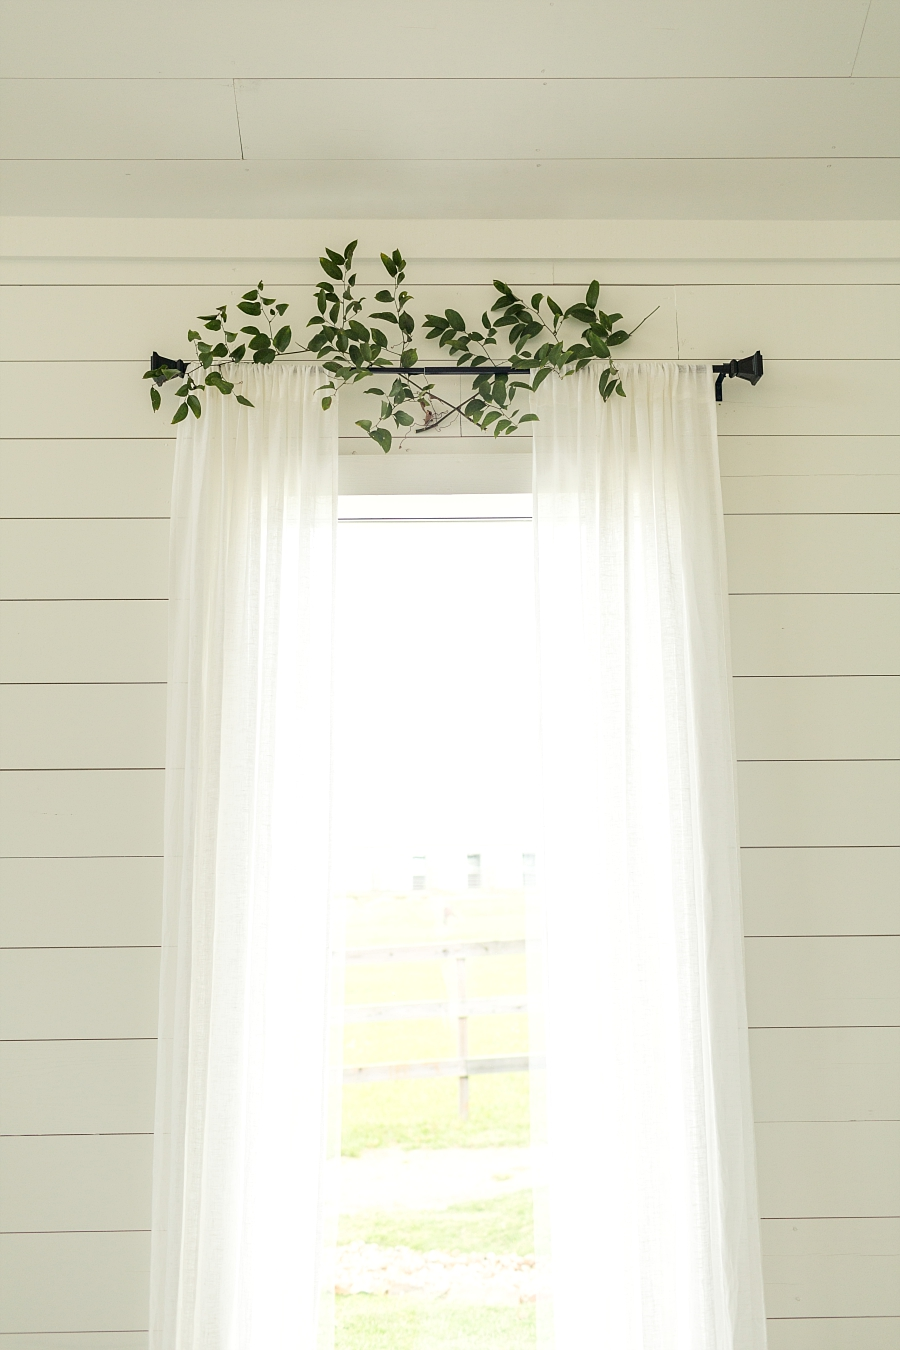 Stacy-Anderson-Photography-The-Farmhouse-Houston-Wedding-Photographer_0012.jpg